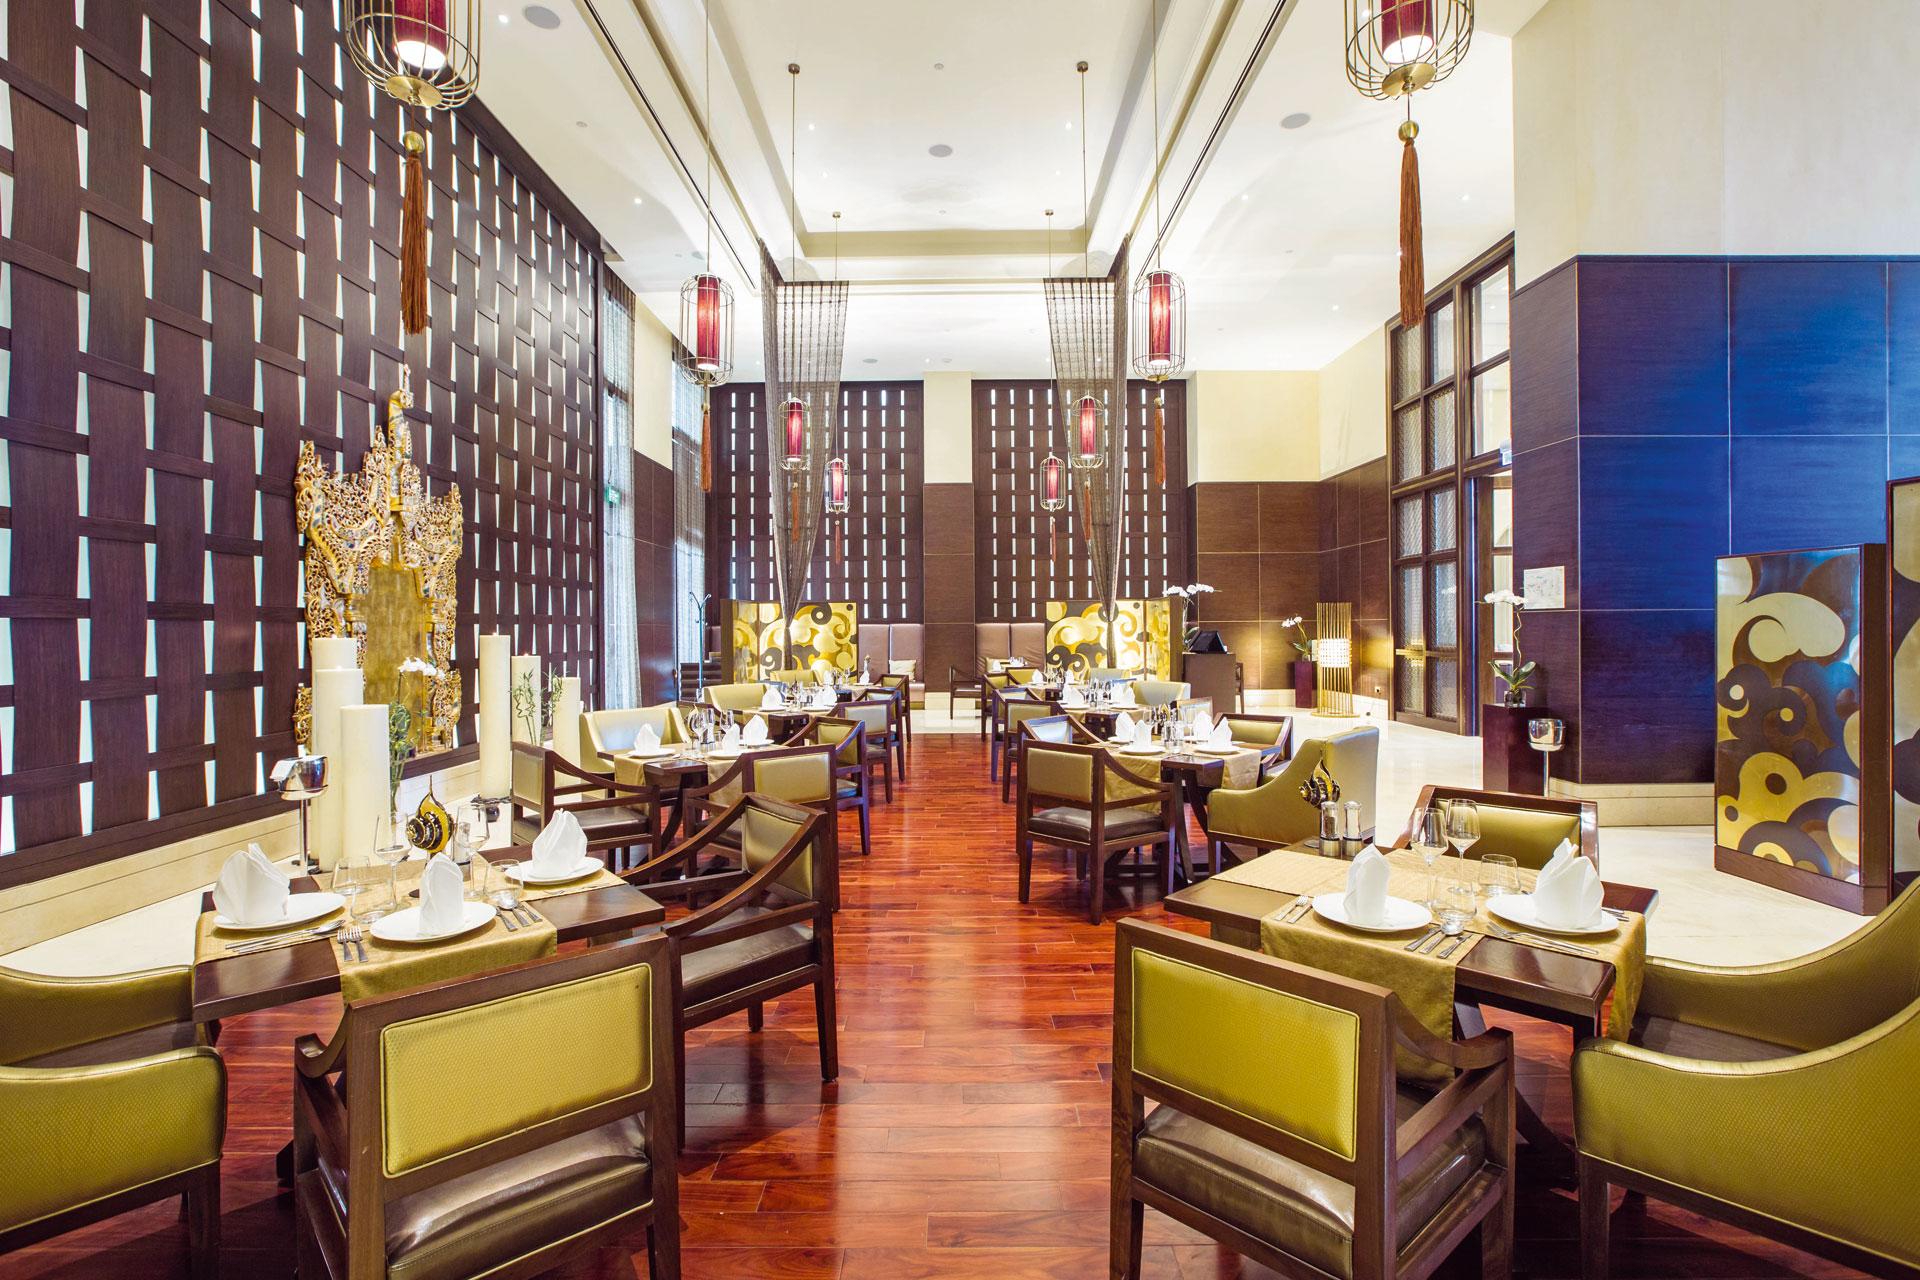 The best vegetarian restaurants in Abu Dhabi